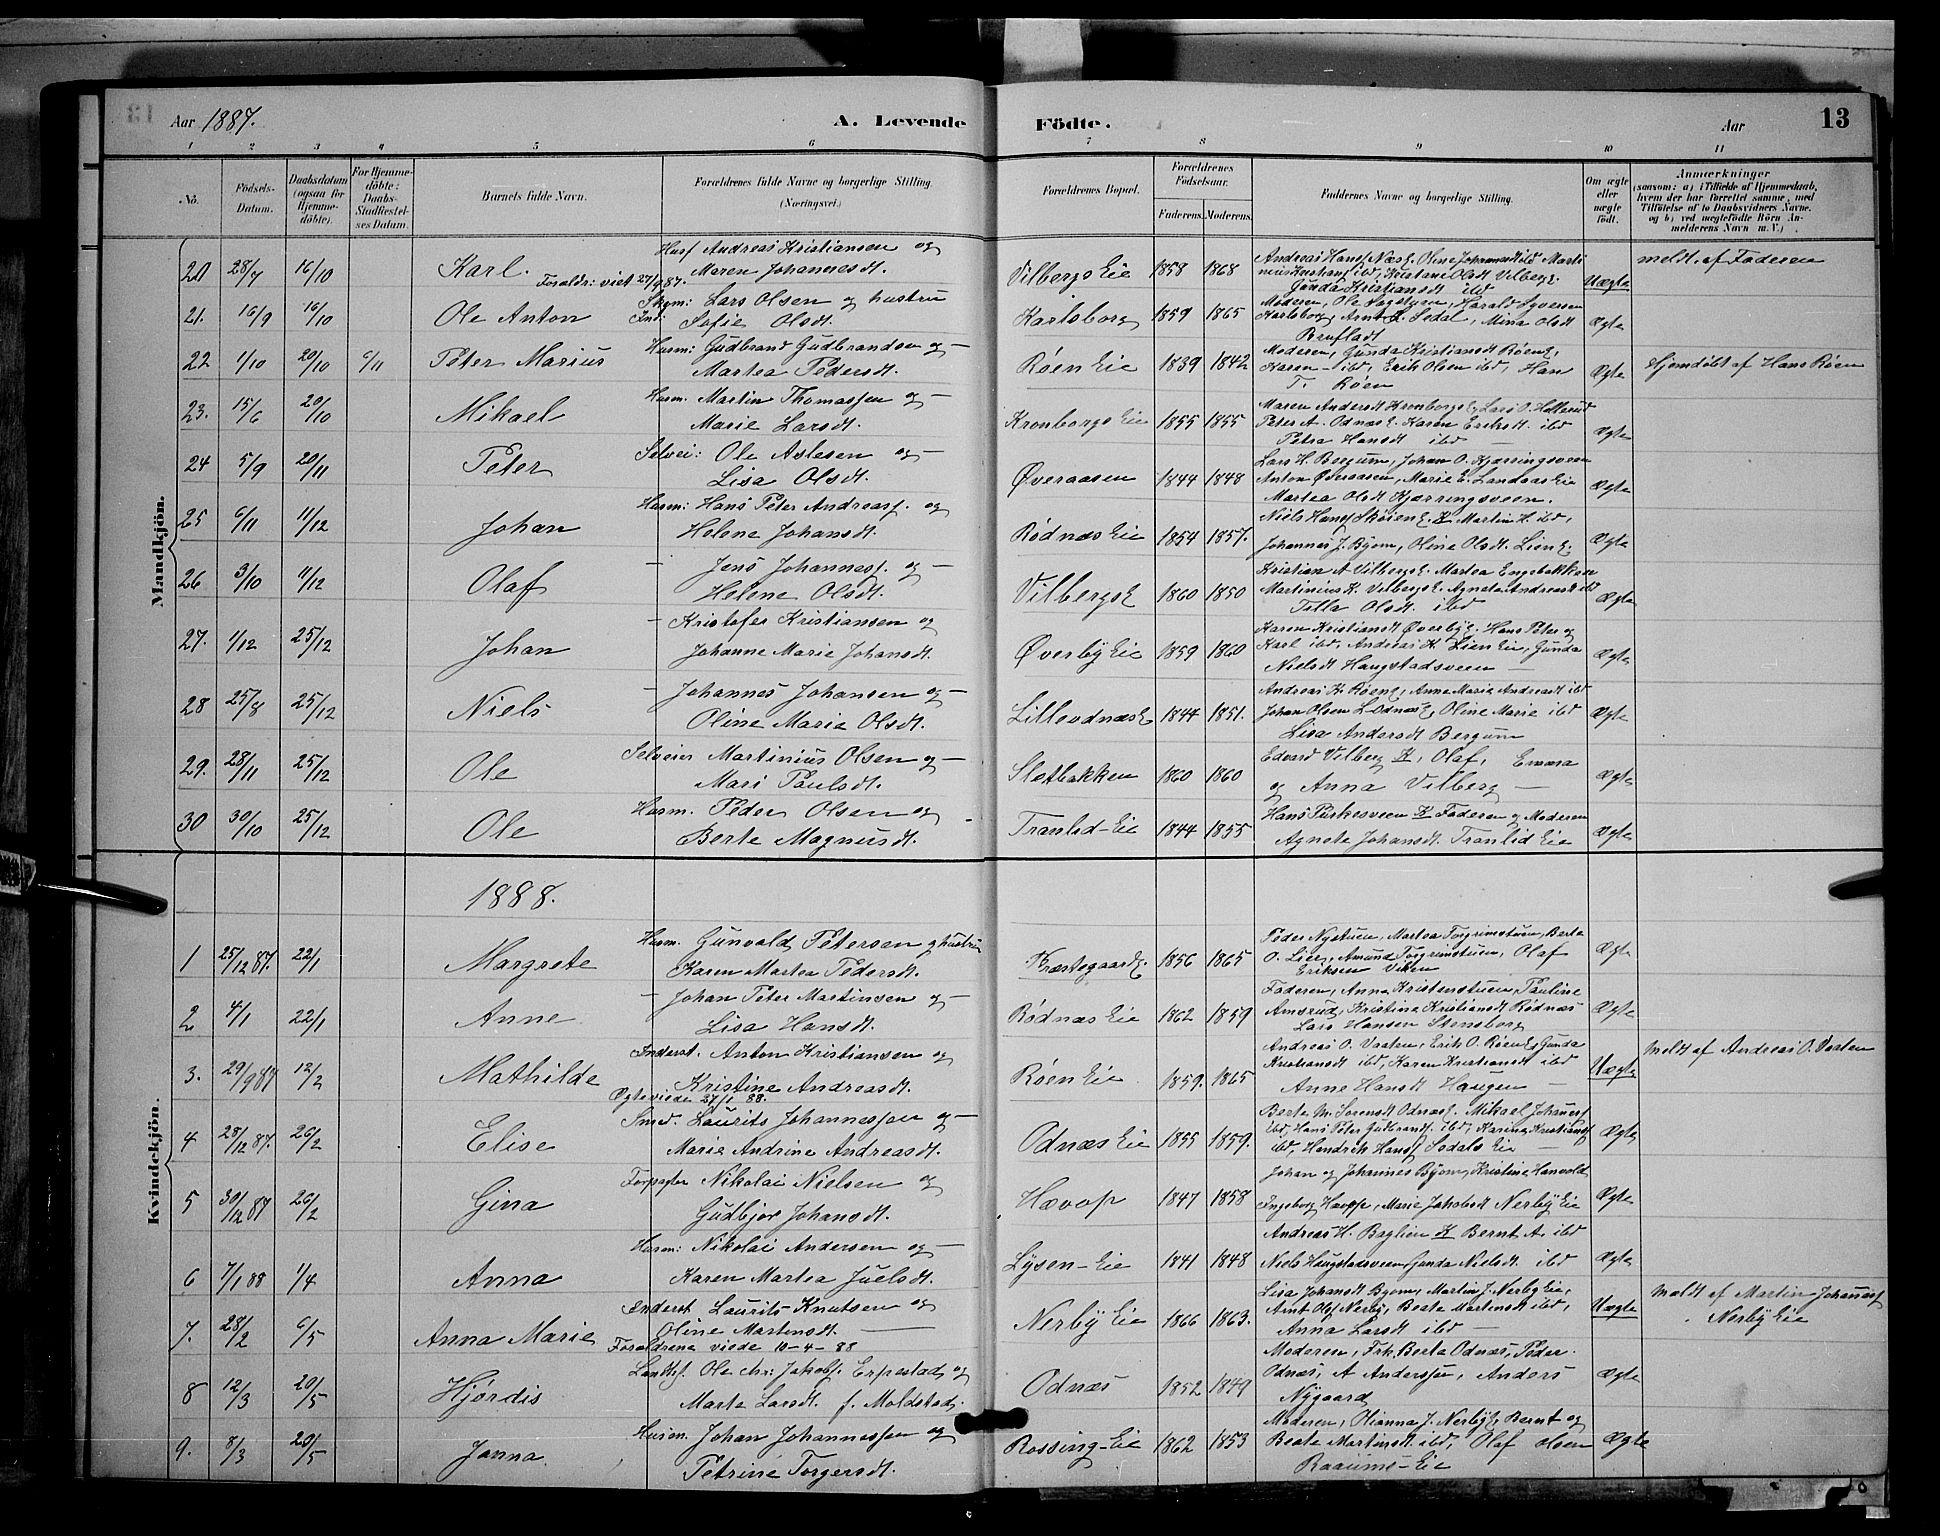 SAH, Søndre Land prestekontor, L/L0003: Klokkerbok nr. 3, 1884-1902, s. 13